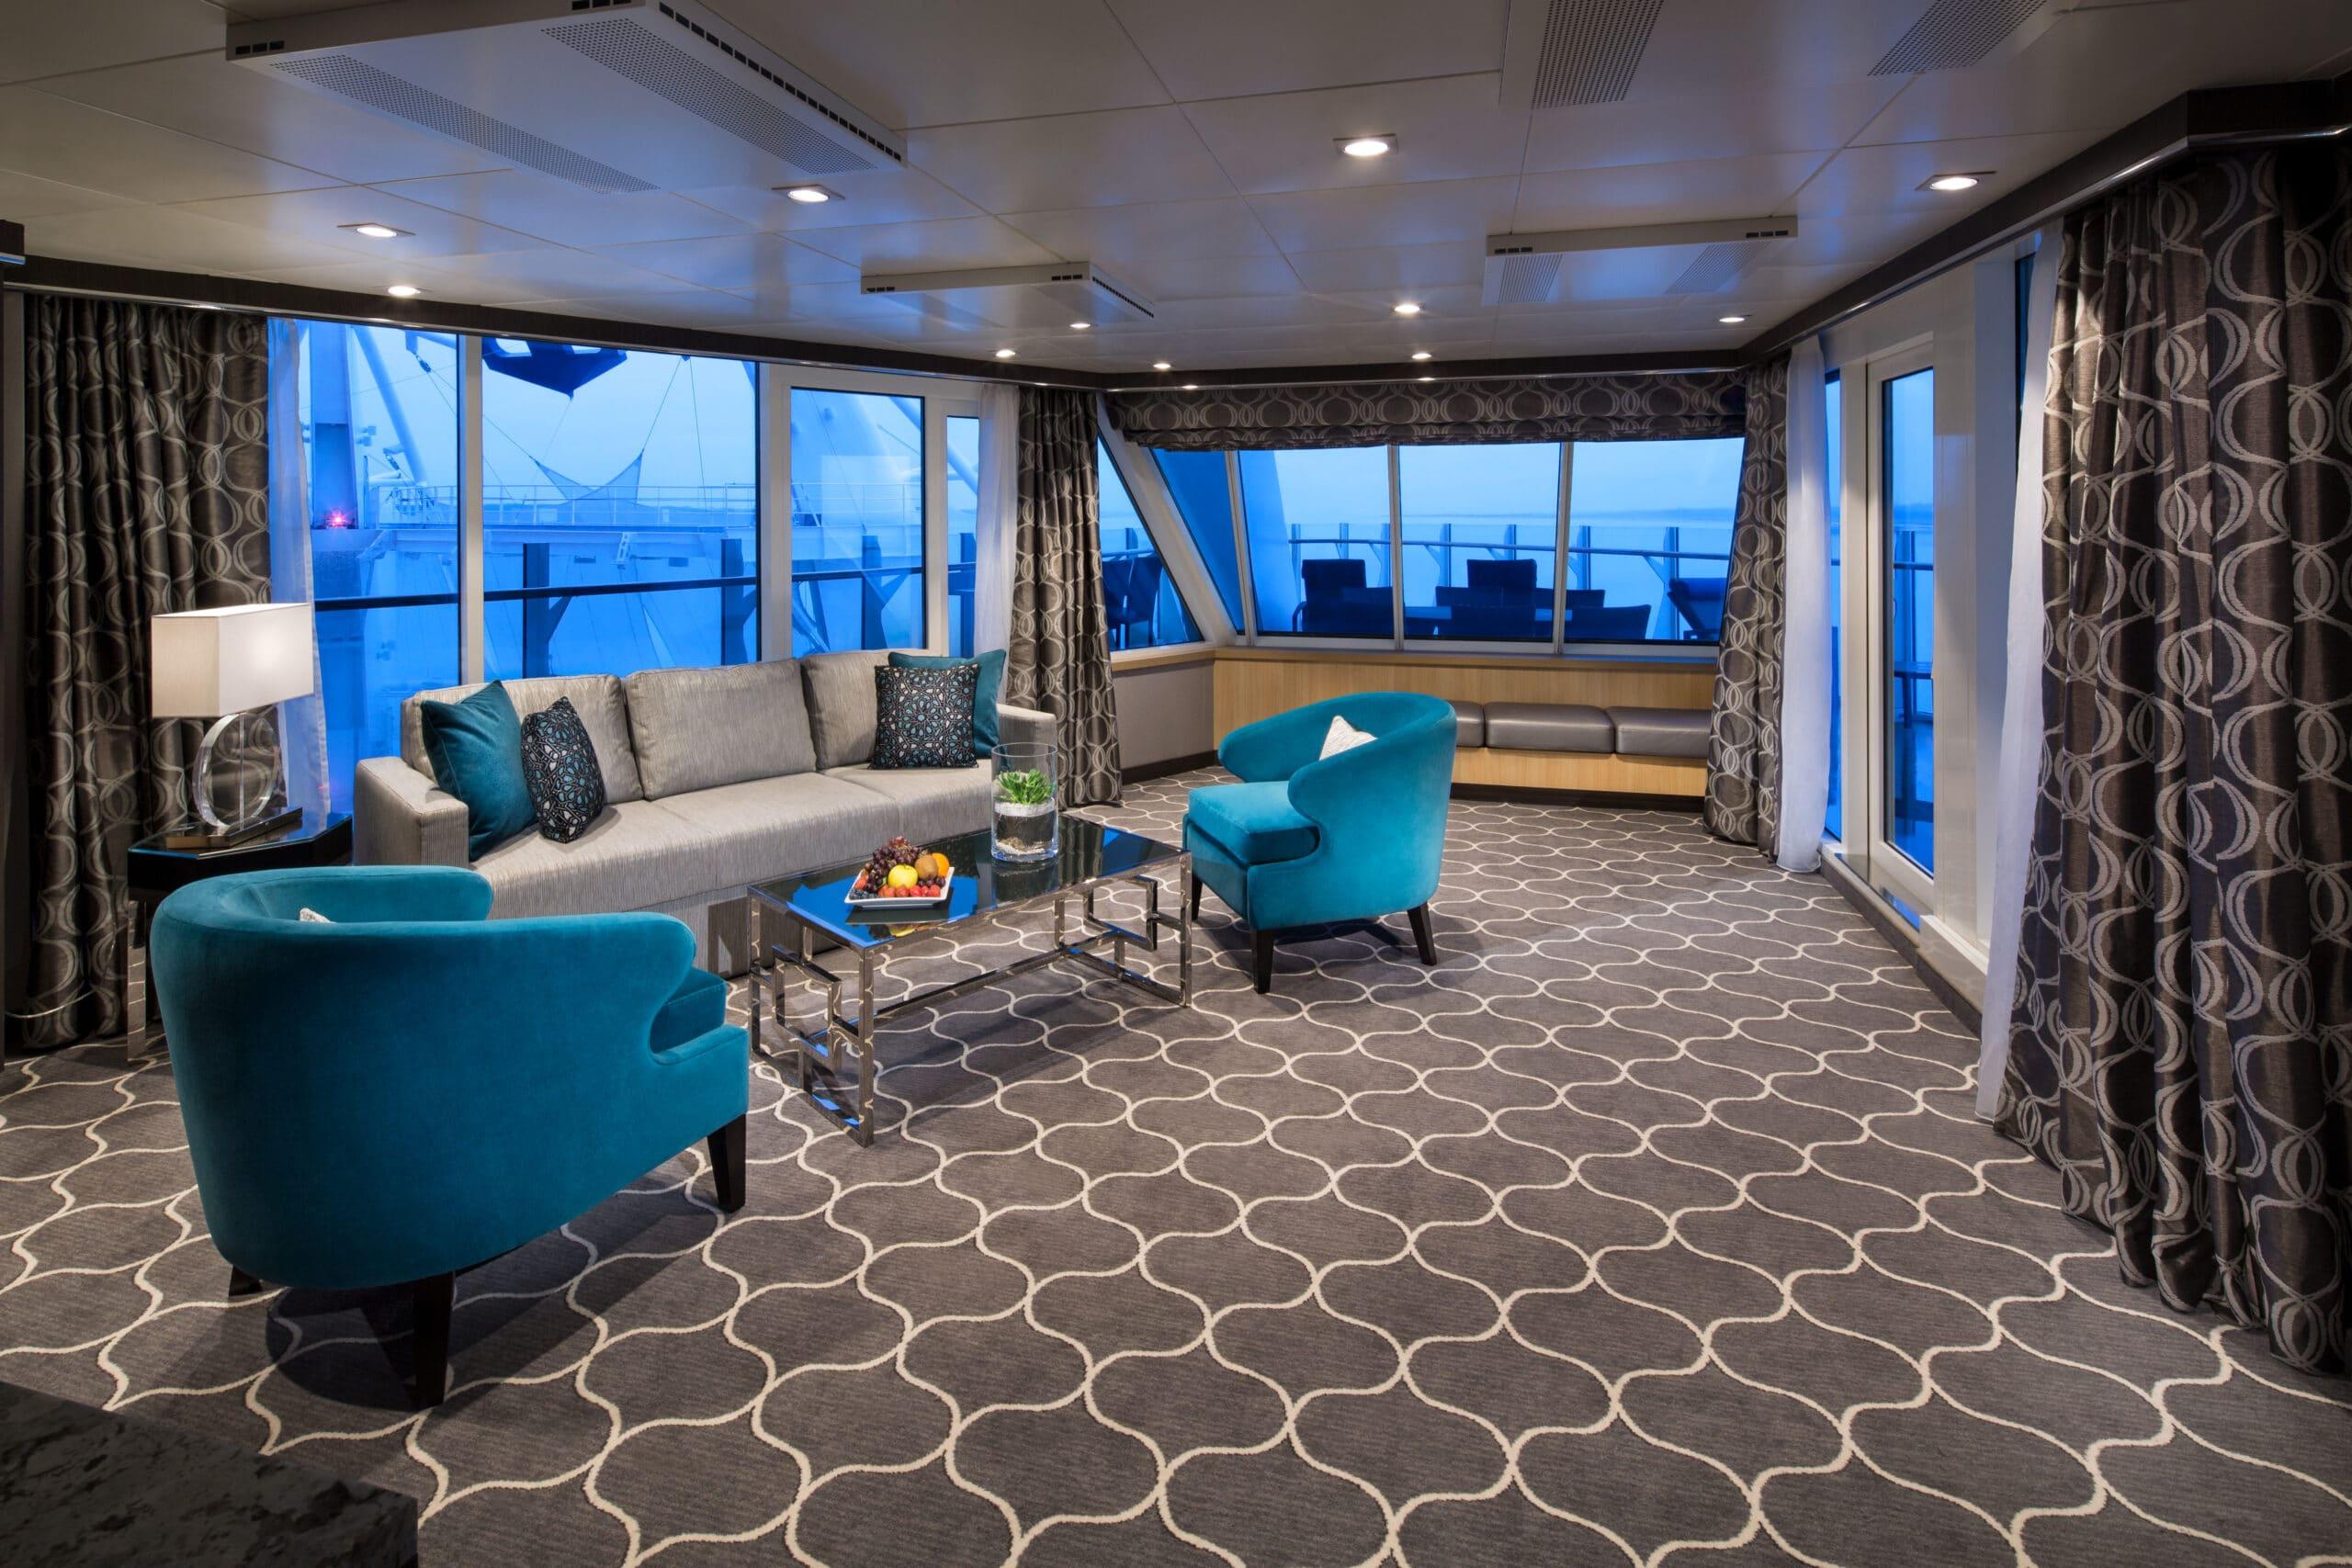 Royal-Caribbean-International-Harmony-of-the-Seas-Symphony-of-the-seas-schip-cruiseschip-categorie A1-Ruime-Aqua-theather-met 2 slaapkamers